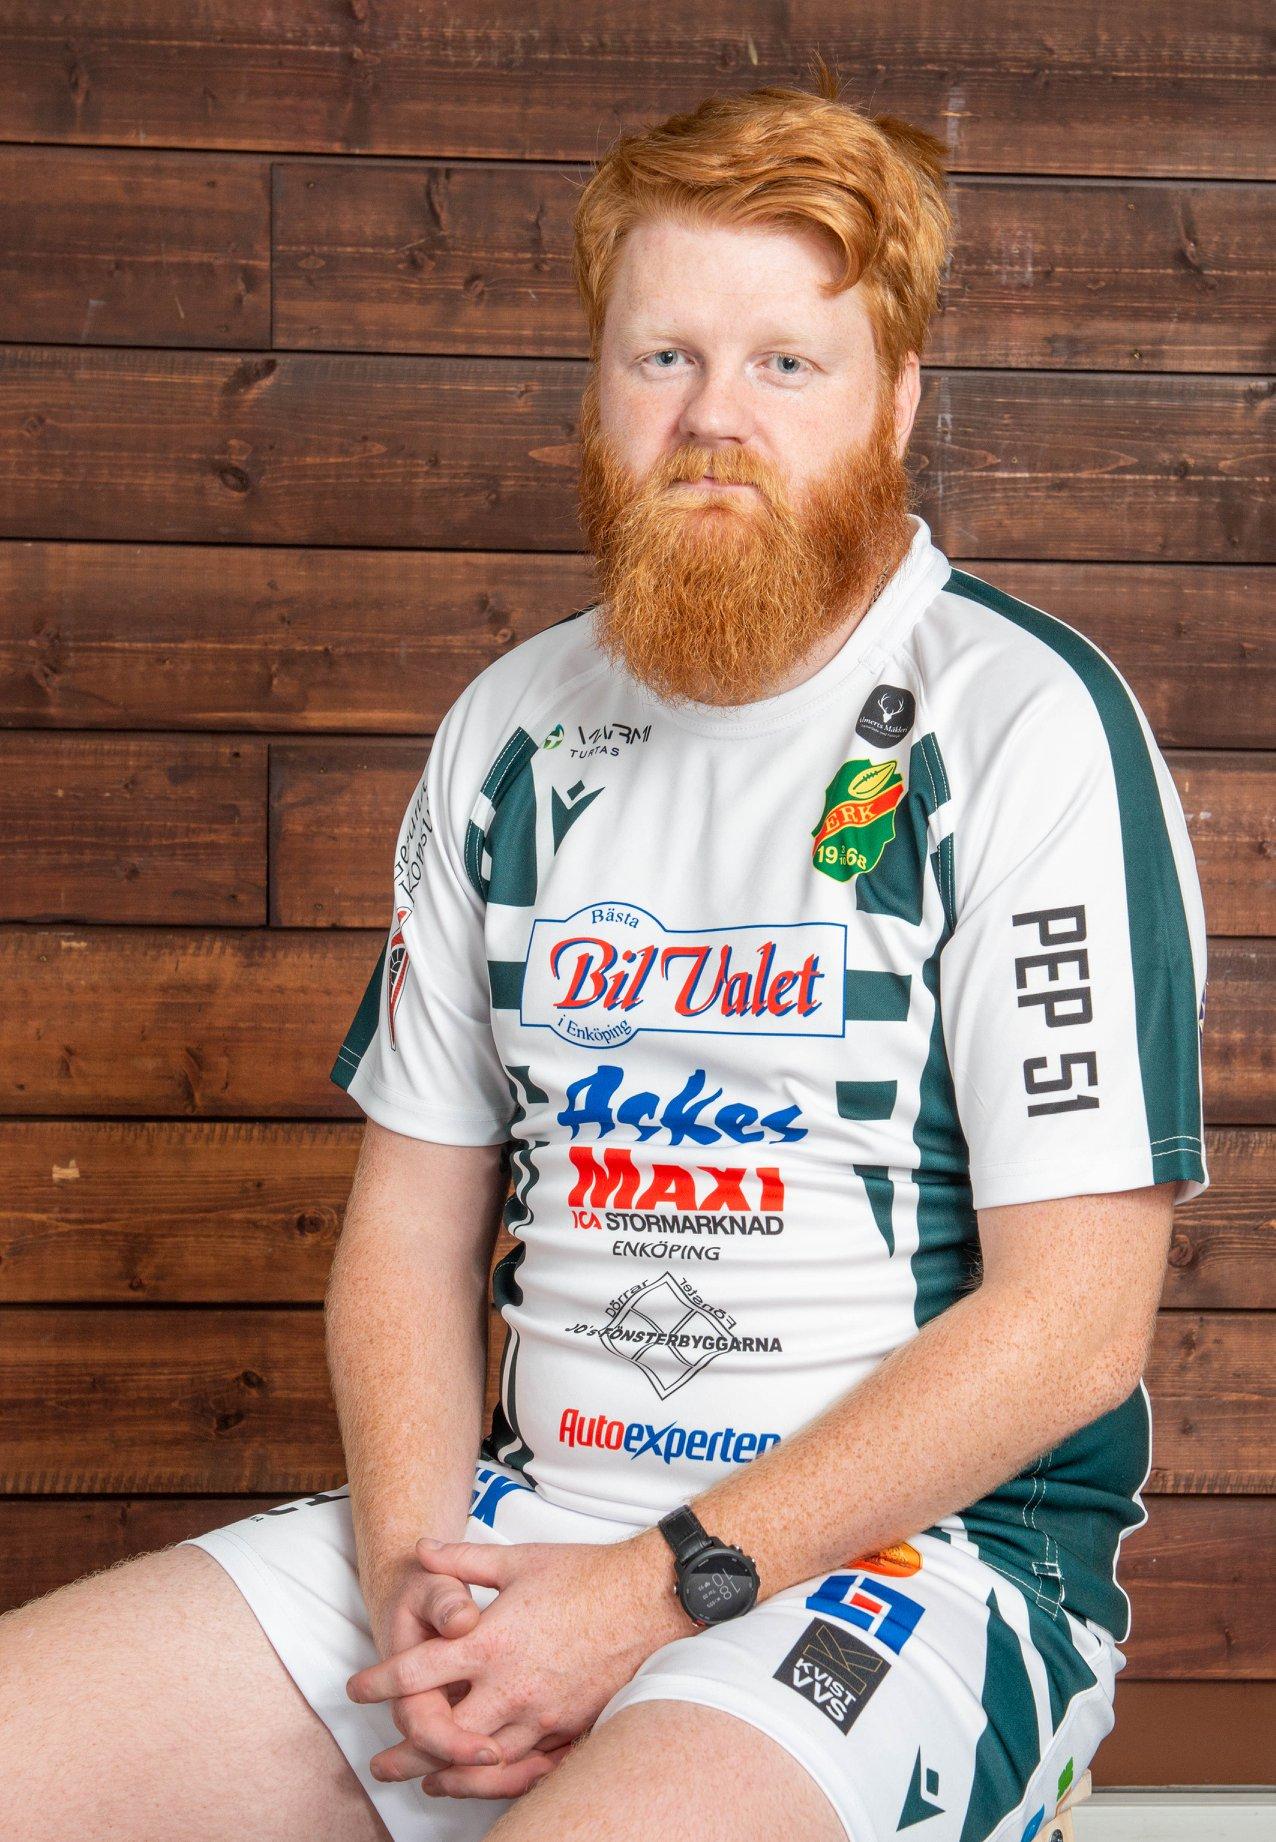 Daniel Henriksson